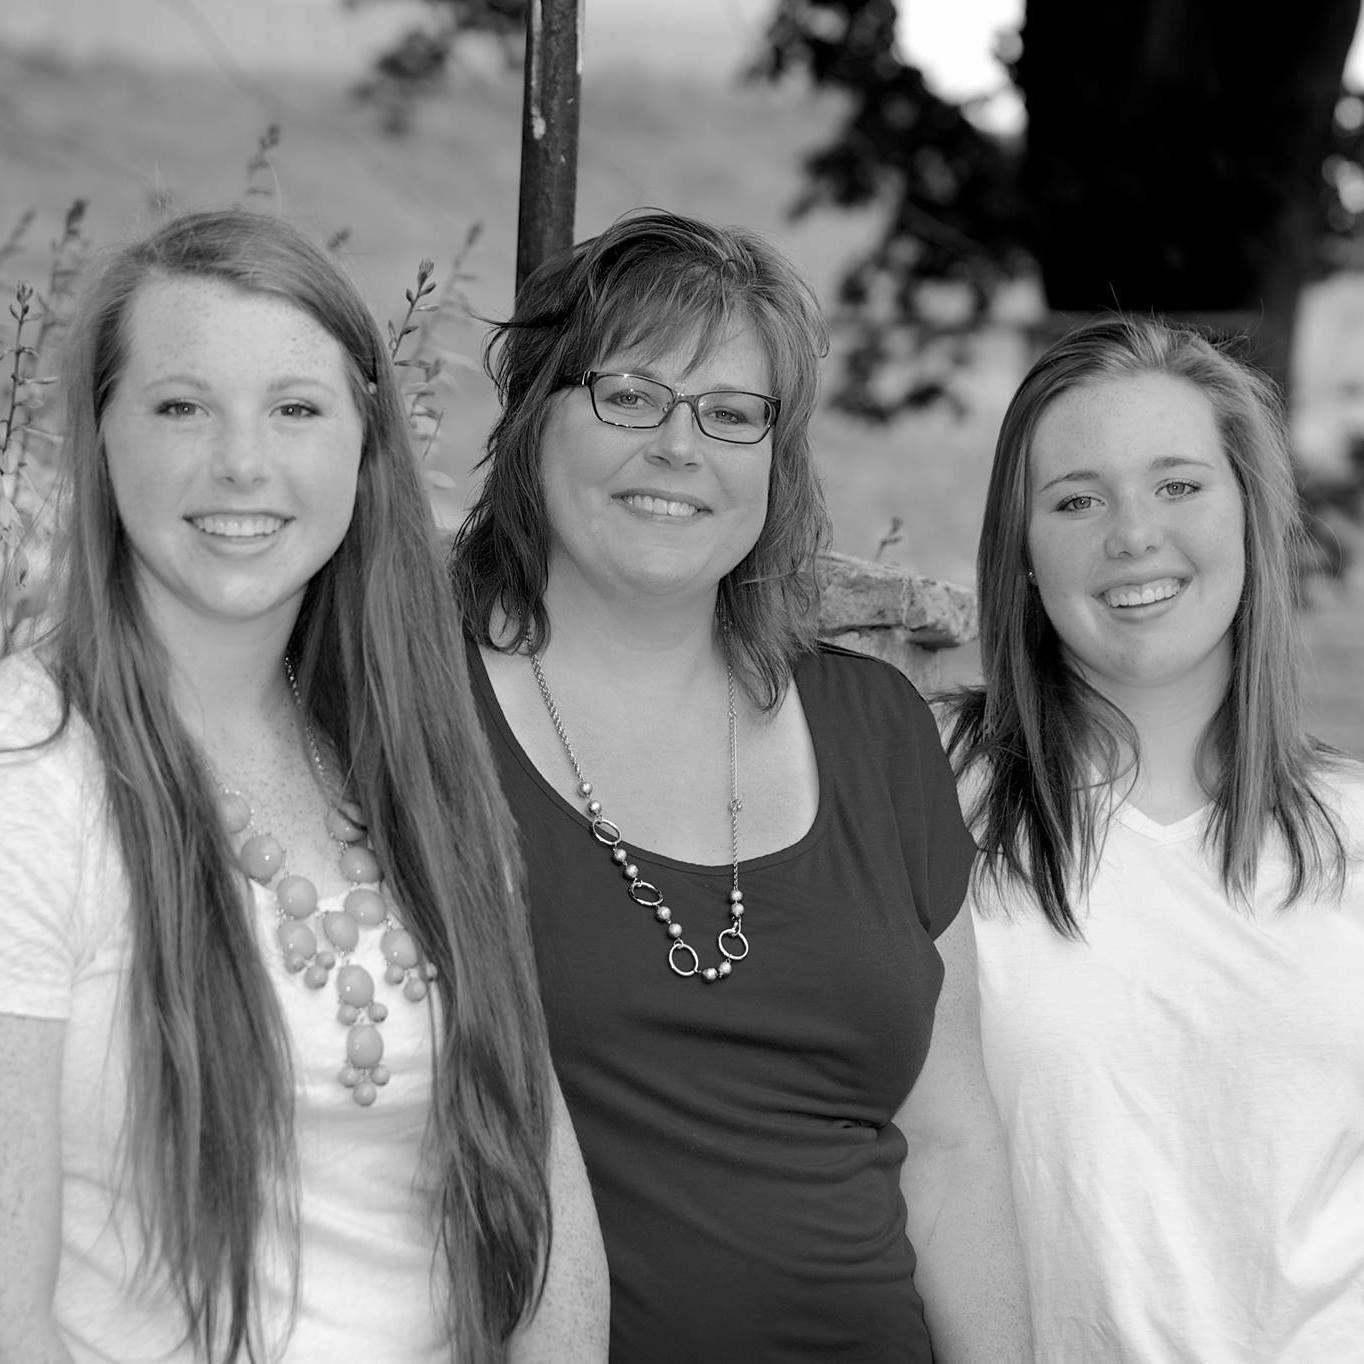 Kathy Single Parents Divorced Adults Group Madison